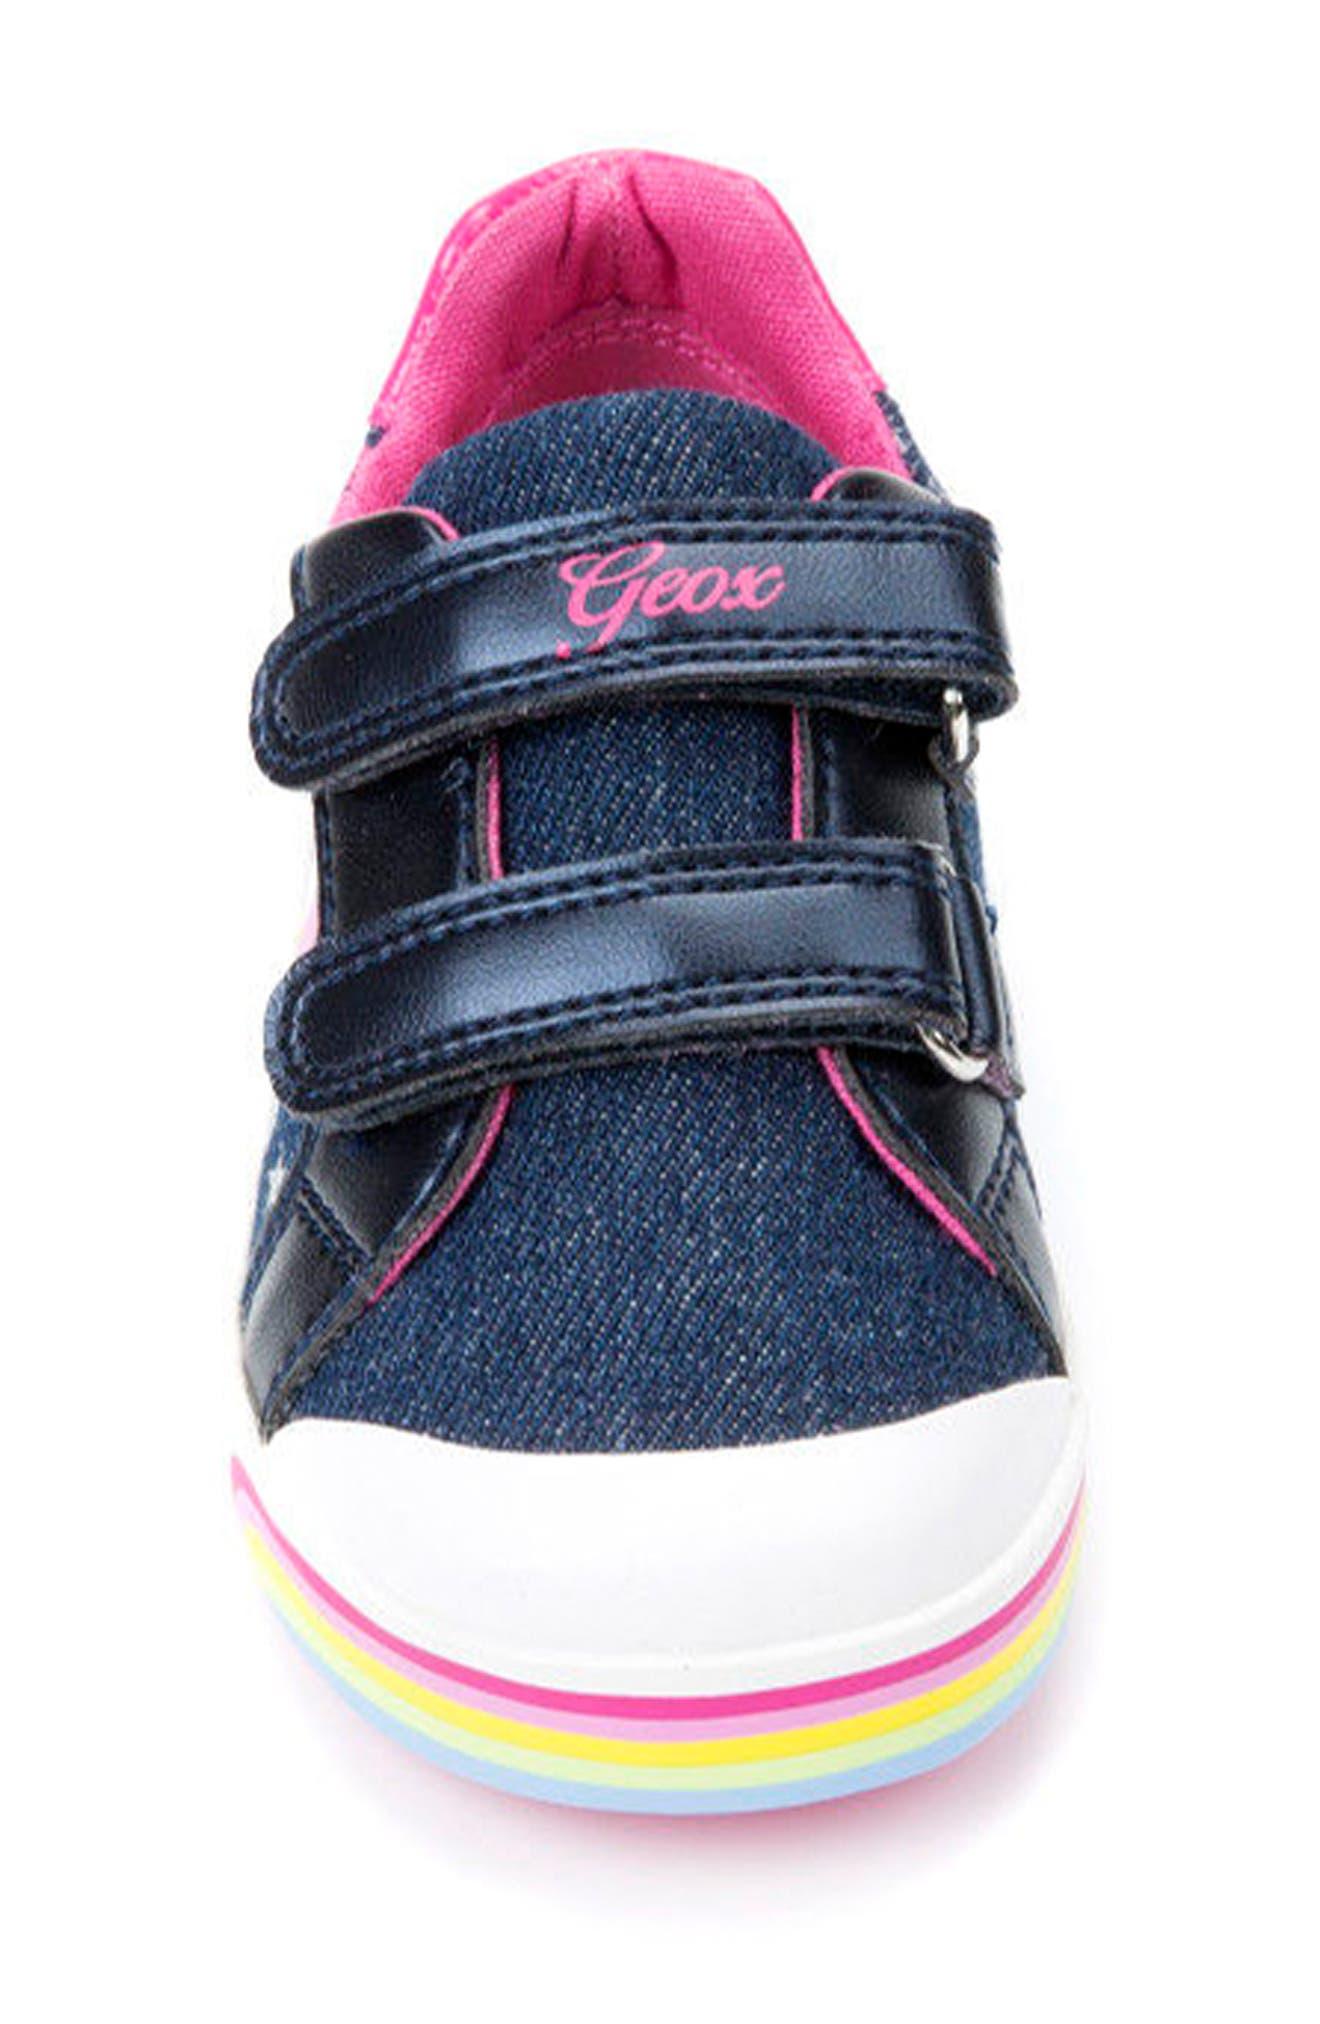 Kilwi Low Top Sneaker,                             Alternate thumbnail 4, color,                             Avio/ Multicolor